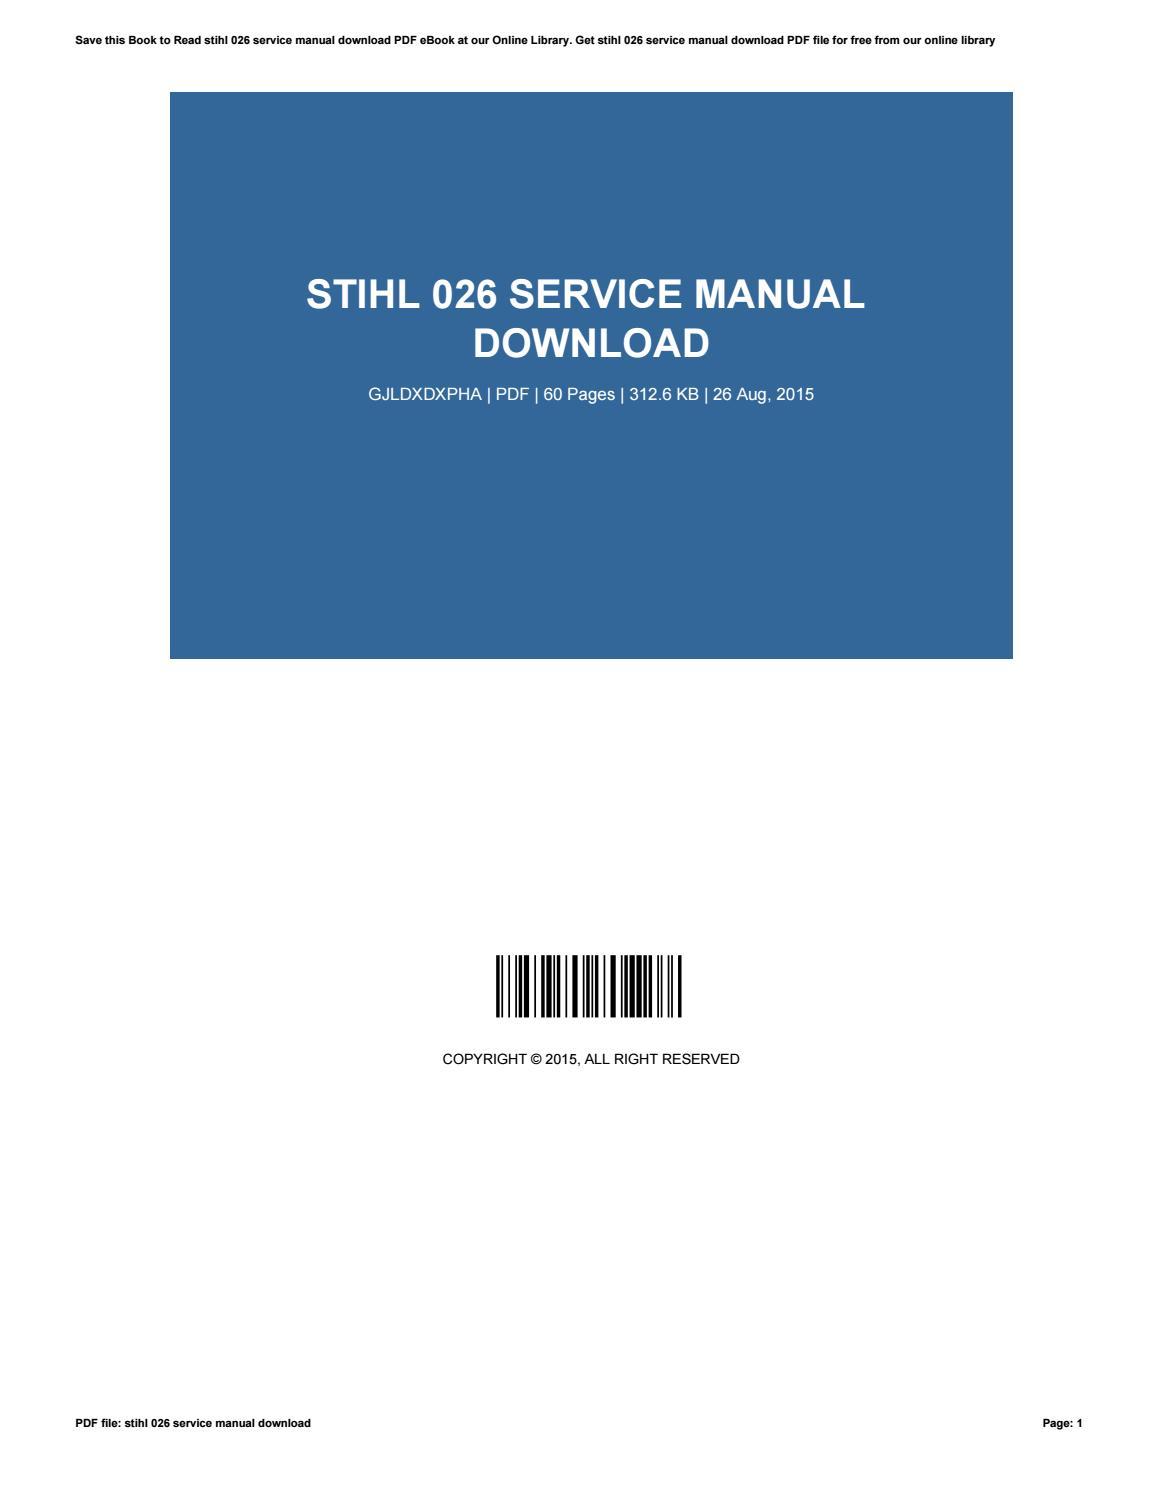 Stihl 026 Repair Manual